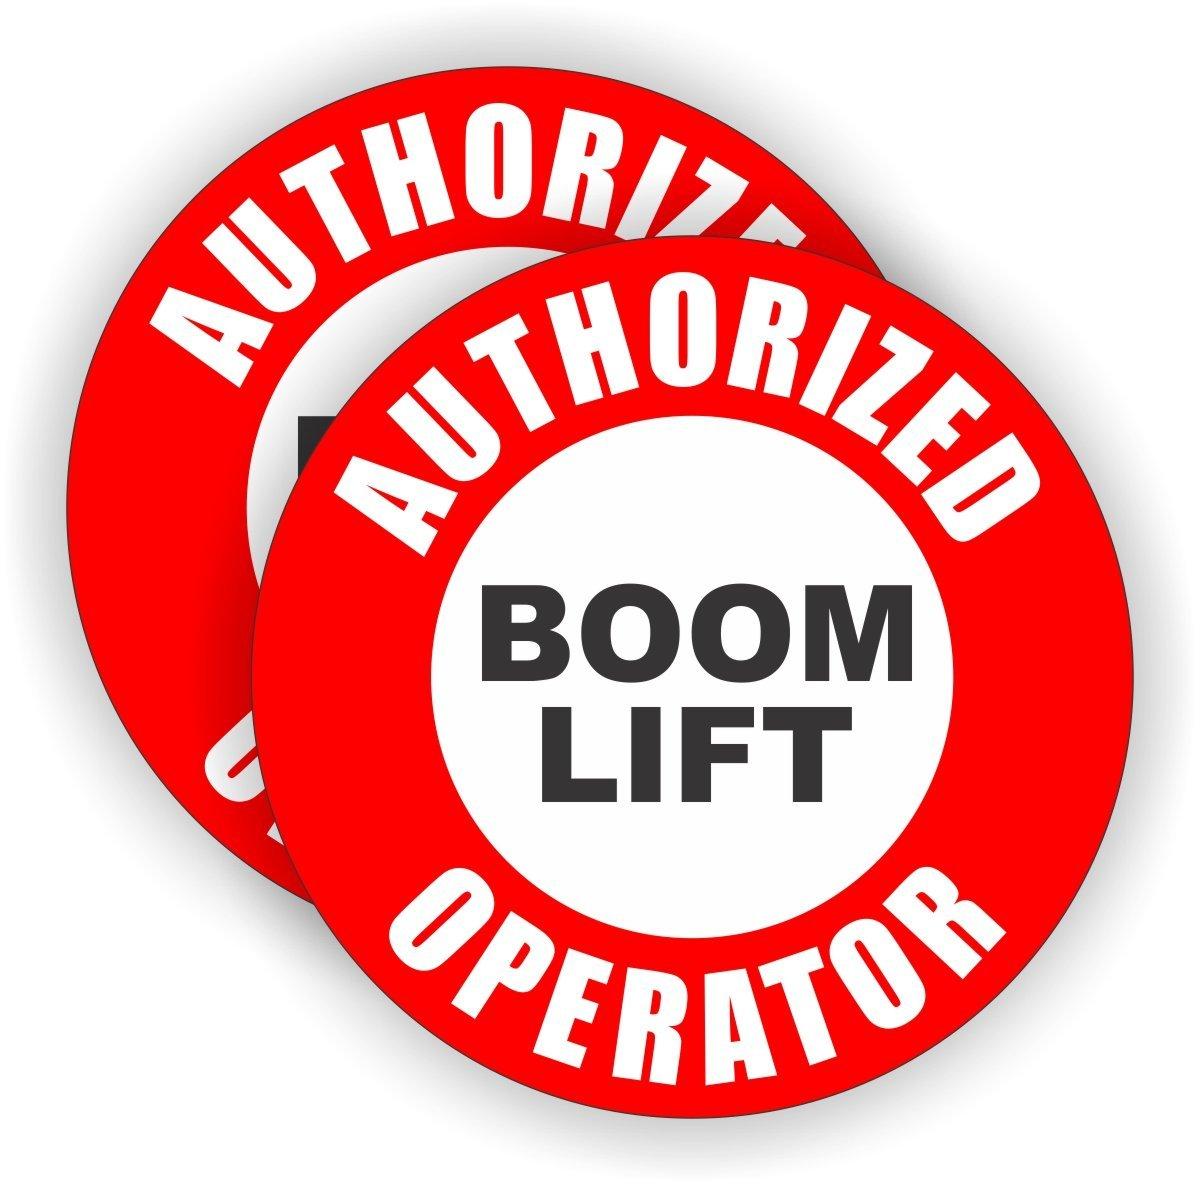 Buy Pair - Authorized Boom Lift Operator Hard Hat Stickers | Helmet